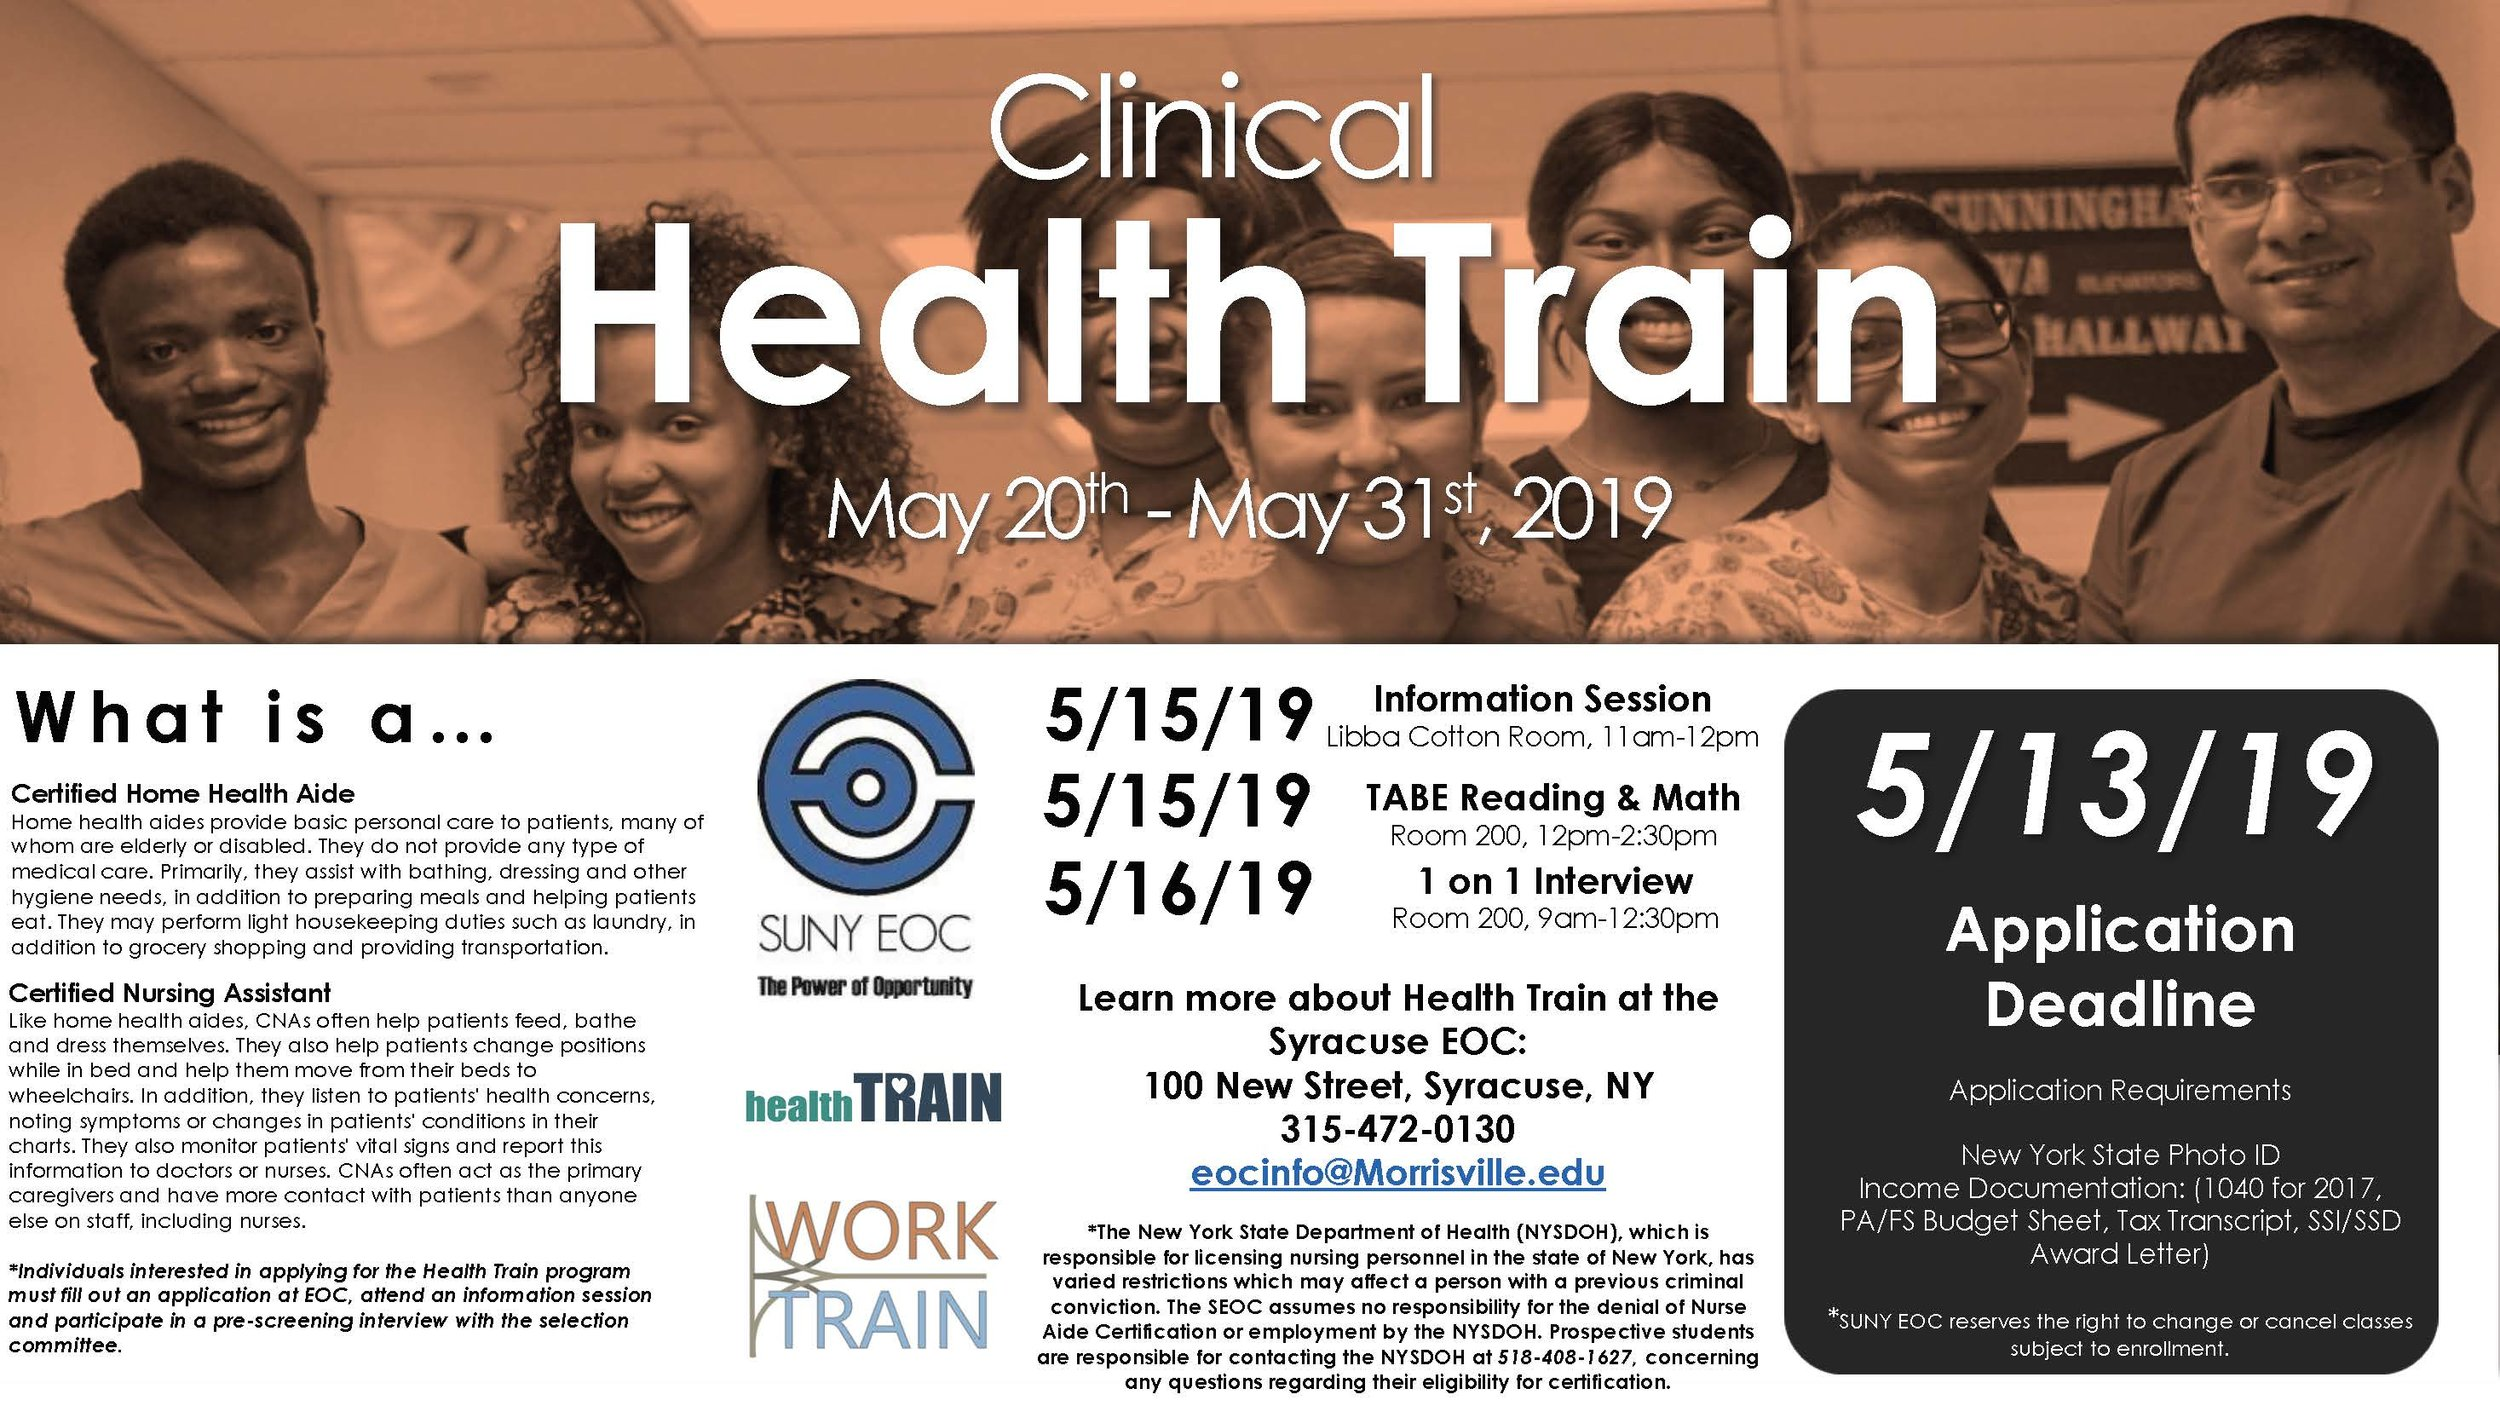 Health Train Flyer Clinical May 2019.jpg